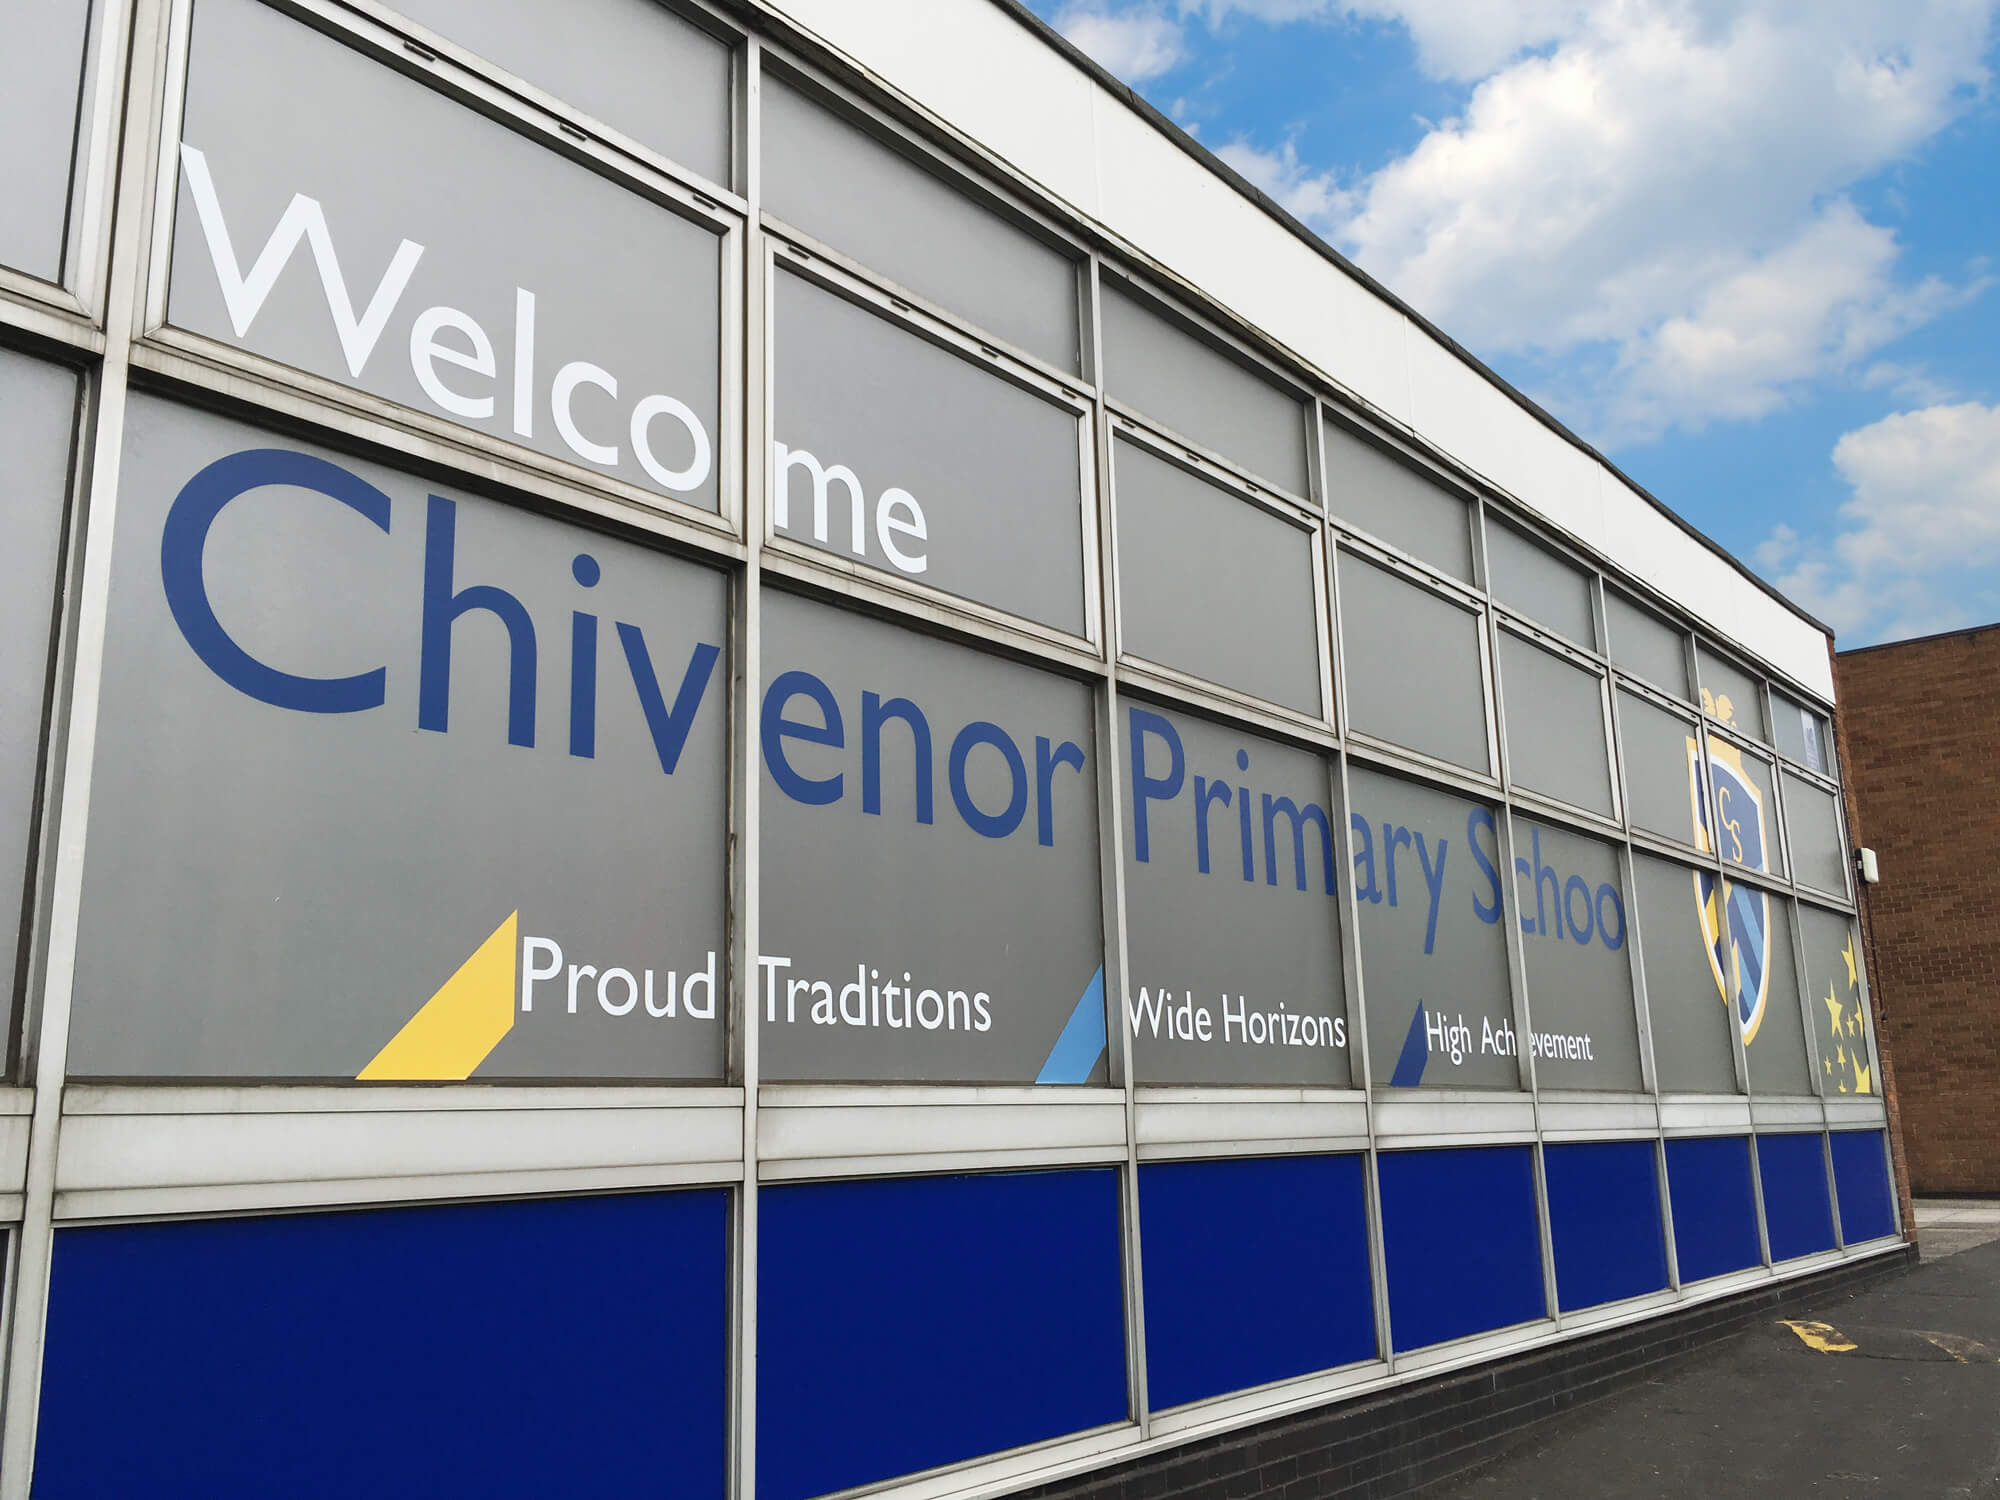 chivenor_primary_school_window_graphics_03.jpg